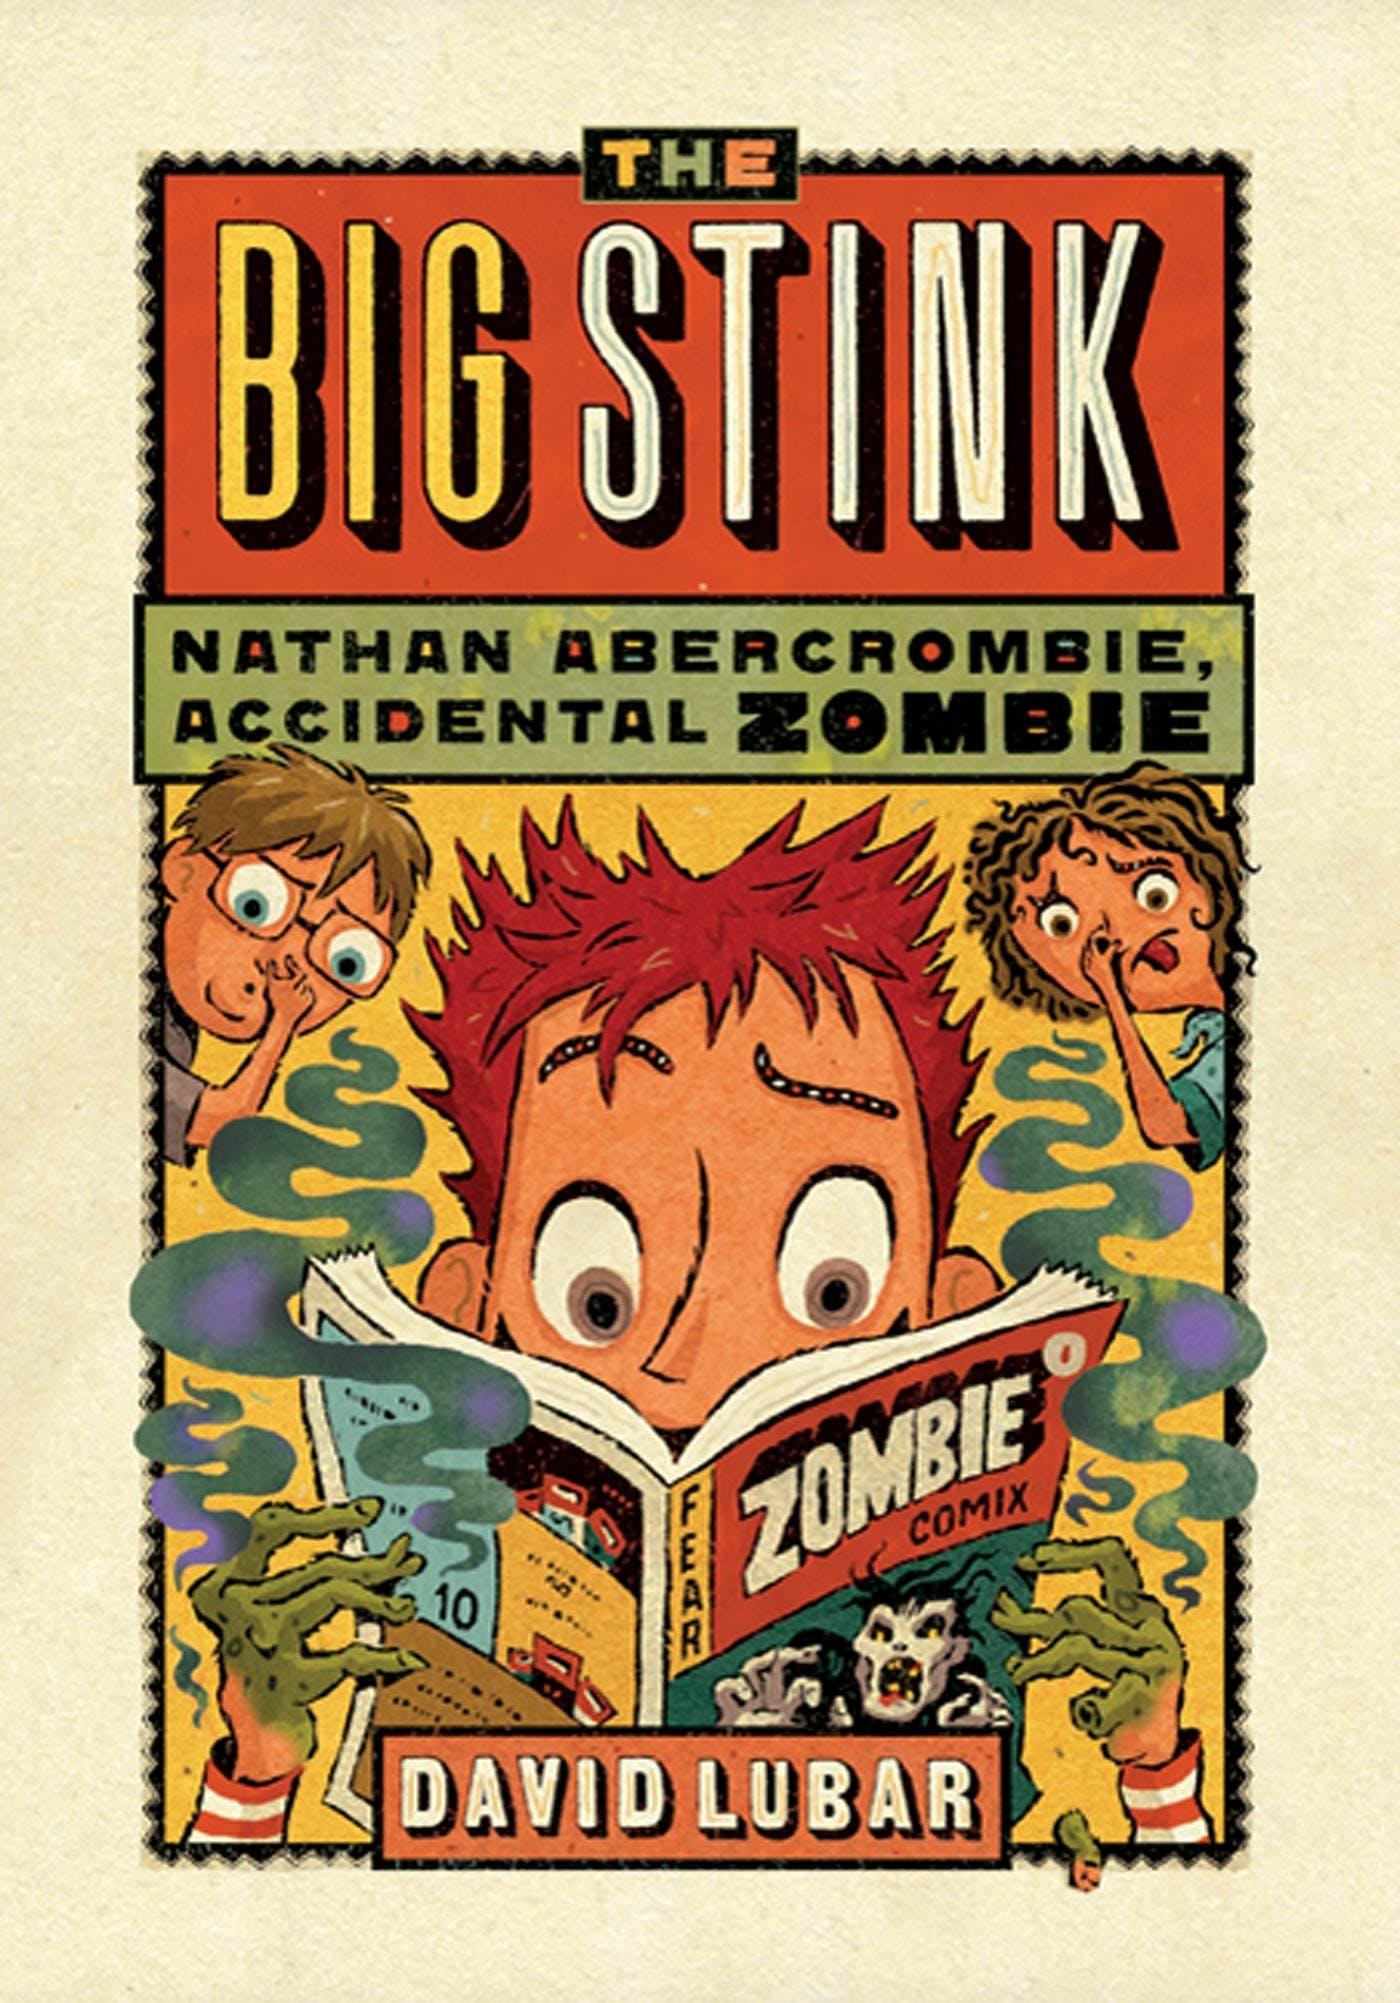 Image of The Big Stink